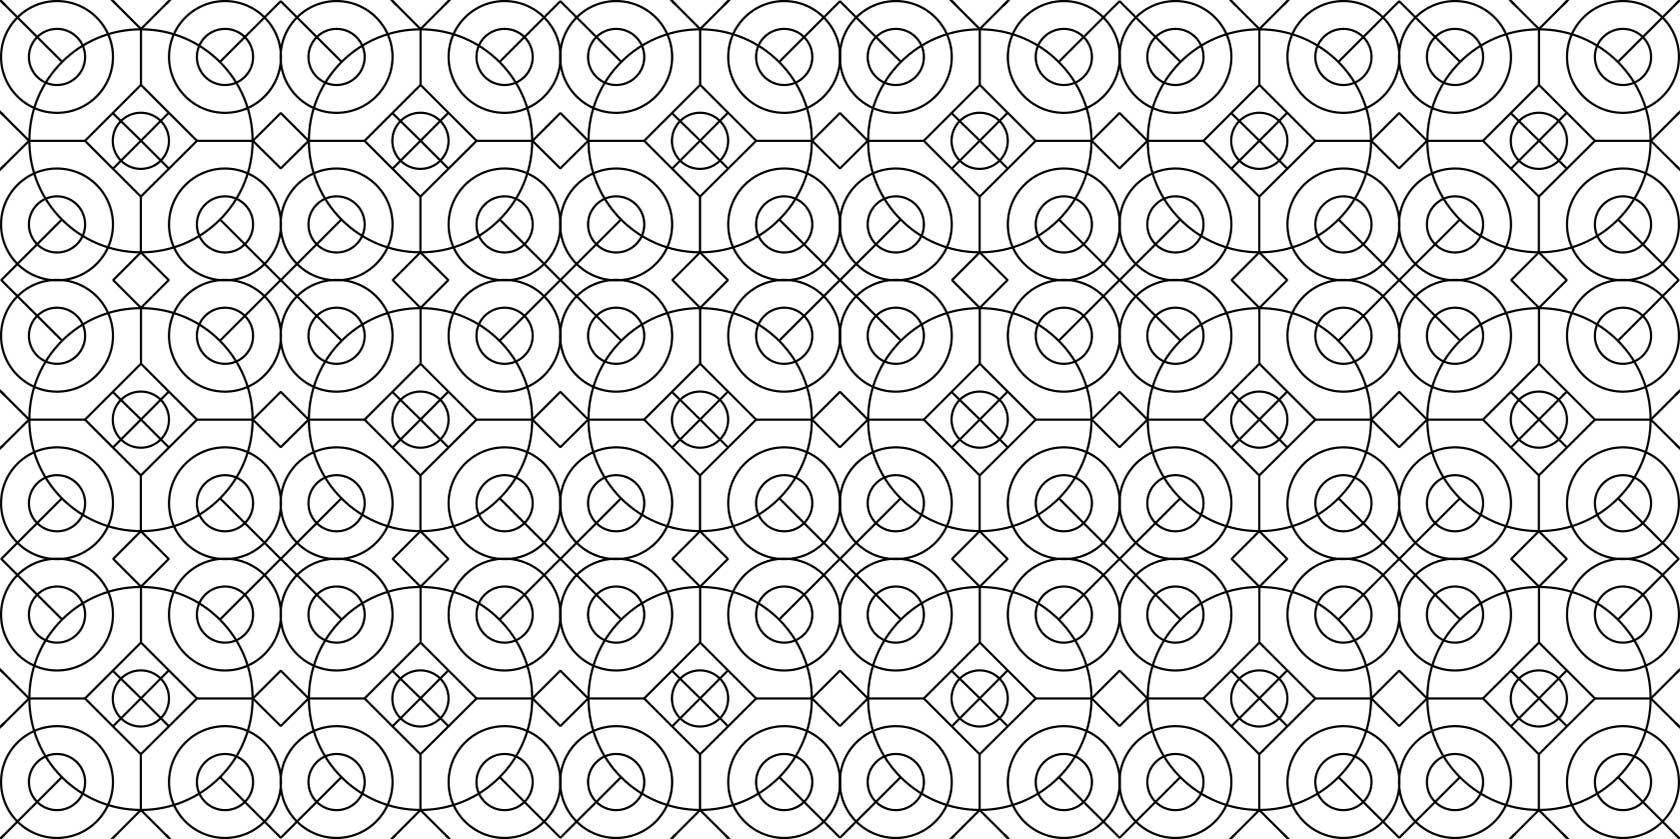 Alquemy Brand Identity Design Pattern1 by Furia